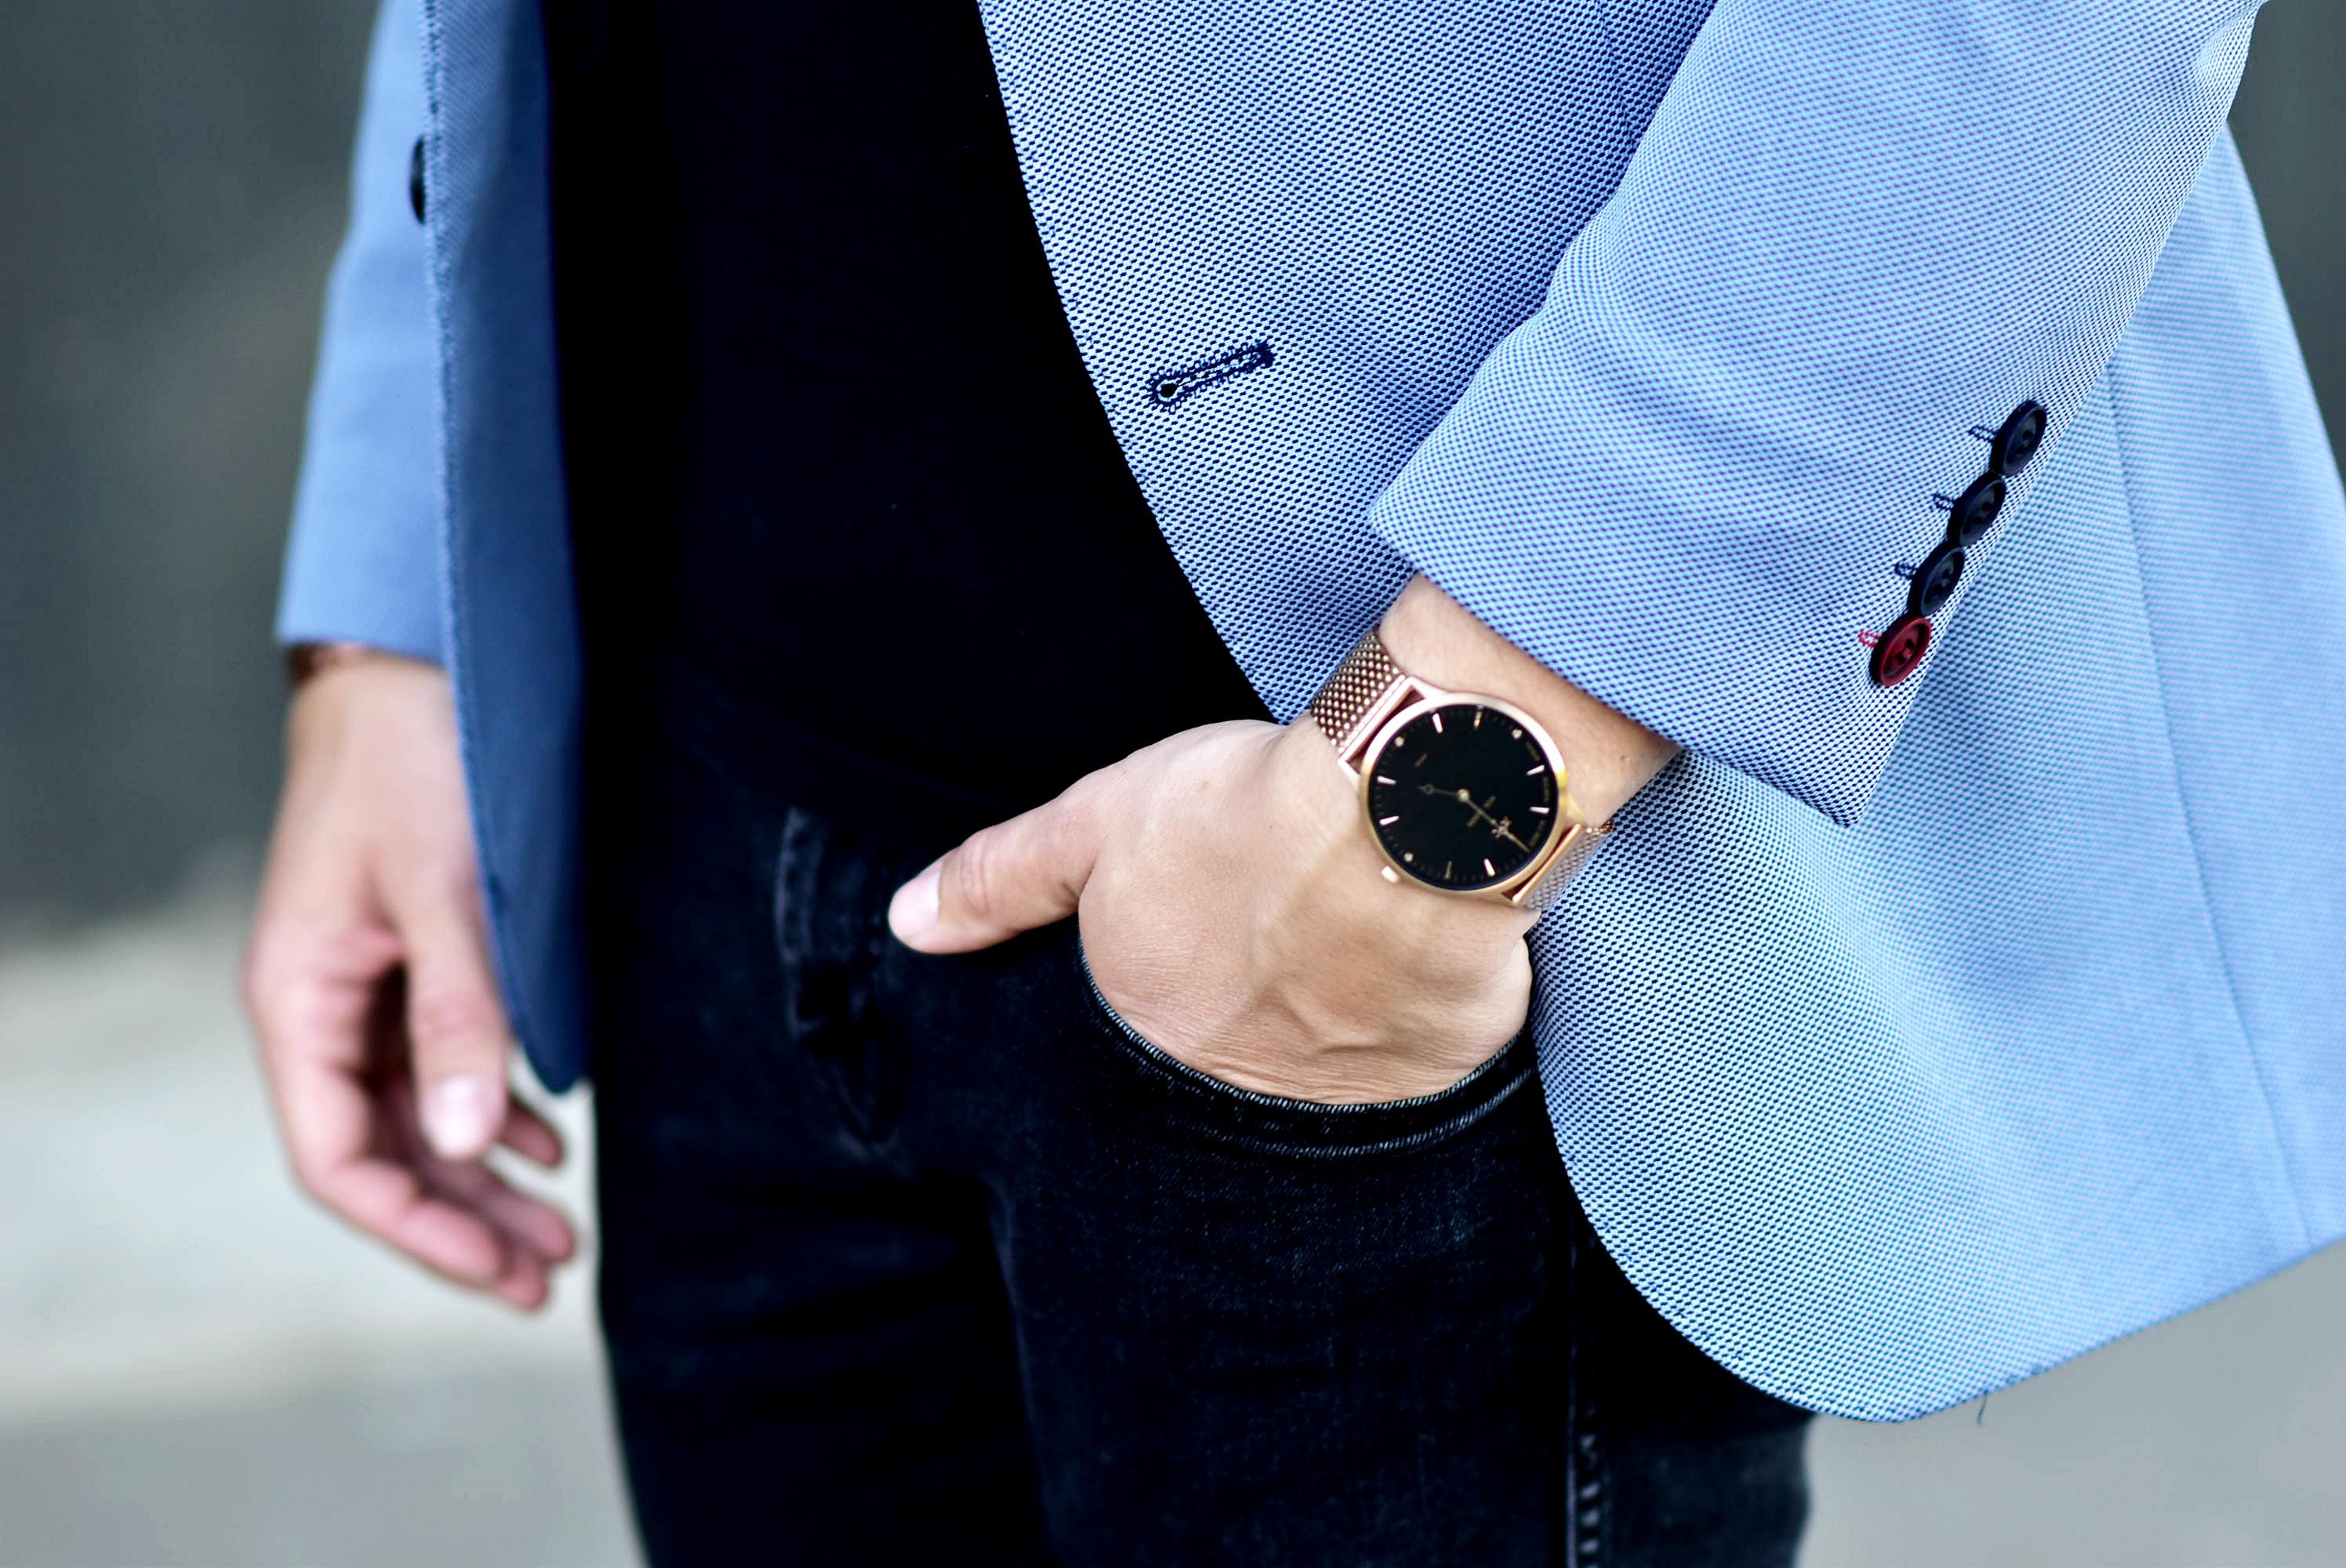 Tommeezjerry-Styleblog-Männerblog-Männer-Modeblog-Berlin-Berlinblog-Outfit-Streetlook-Royalblauer-Blazer-Royalblue-All-Black-Look-Chelsea-Boots-Skinny-Jeans-10